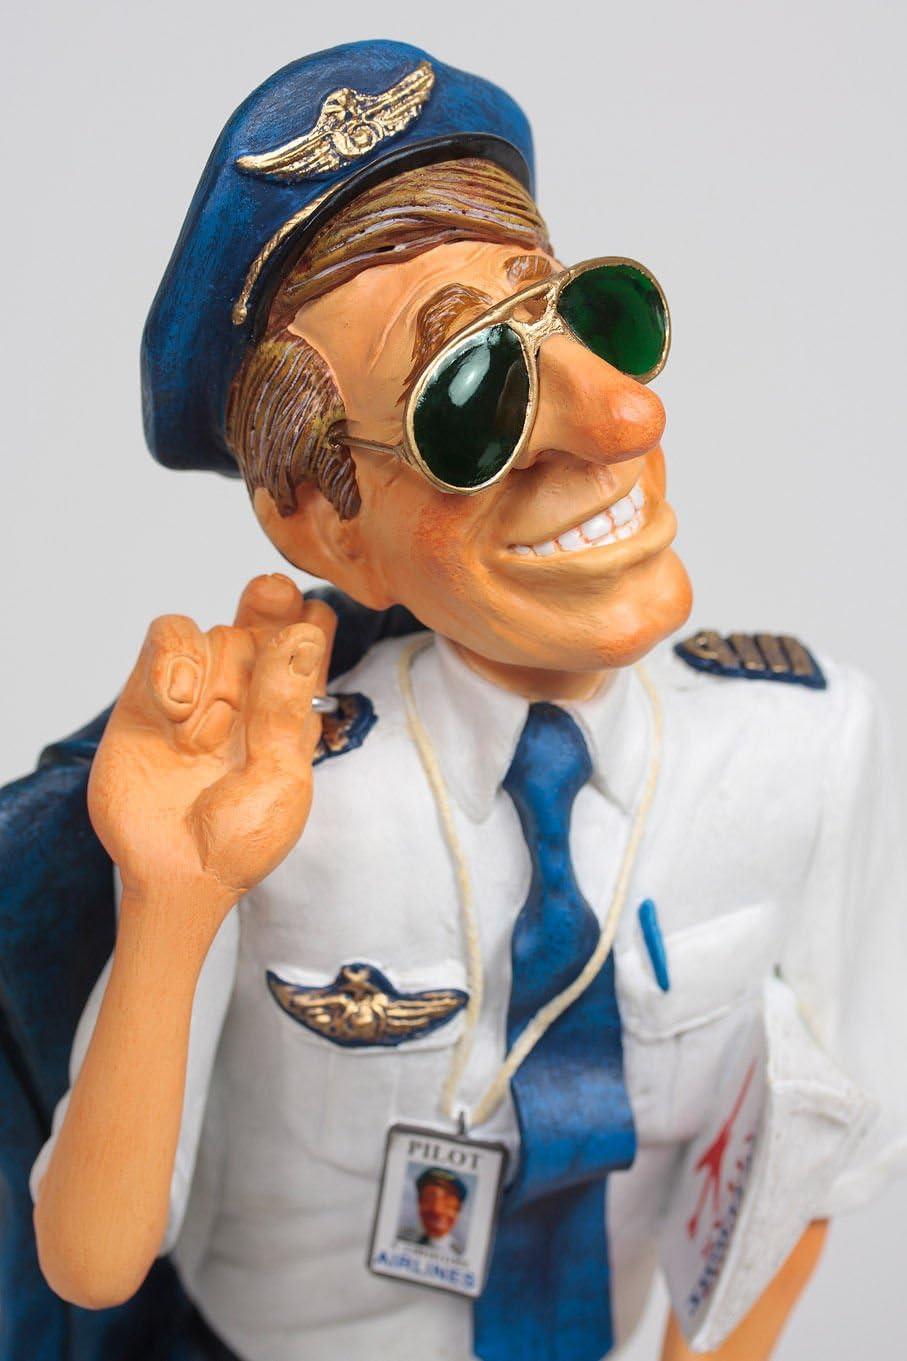 FO85523  FIGURINE METIER LE PILOTE D AVION  COLLECTION FORCHINO EXCEPTIONELLE